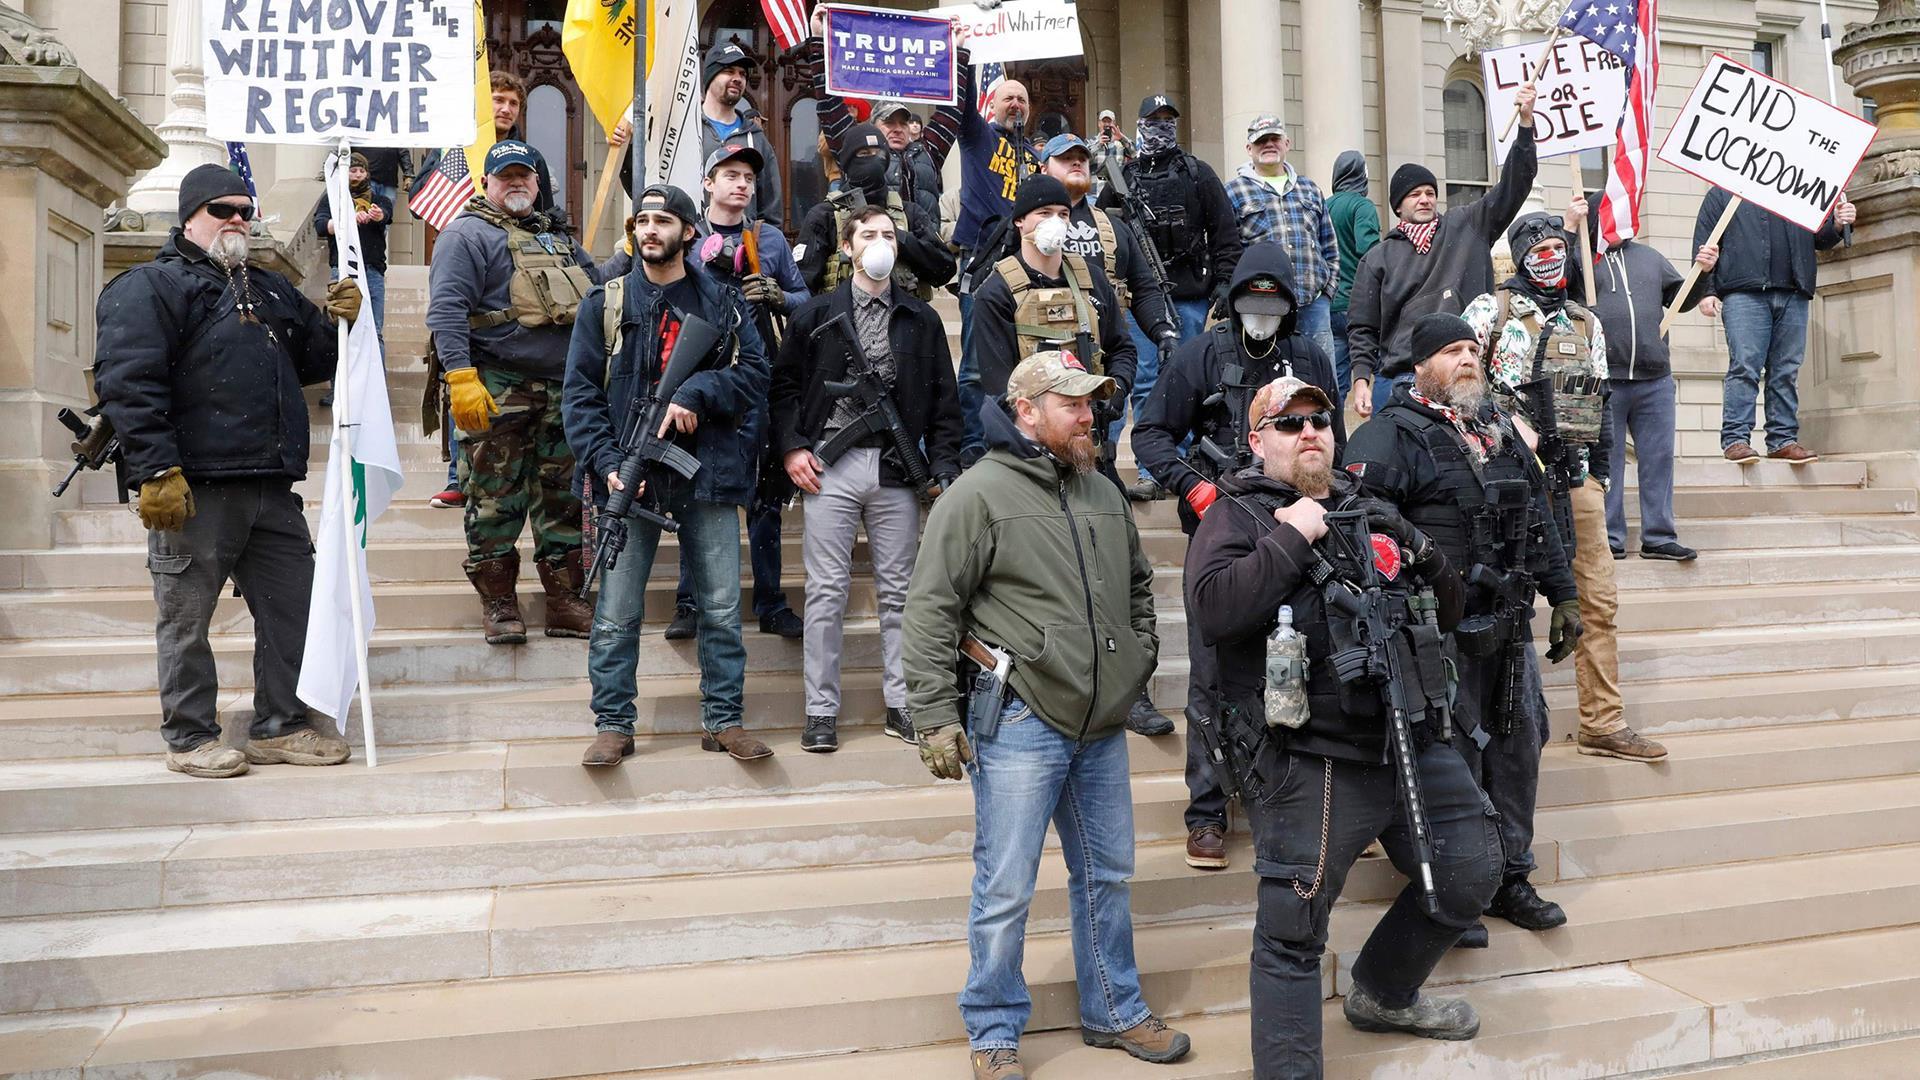 Lock Her Up Anti Whitmer Coronavirus Lockdown Protestors Swarm Michigan Capitol